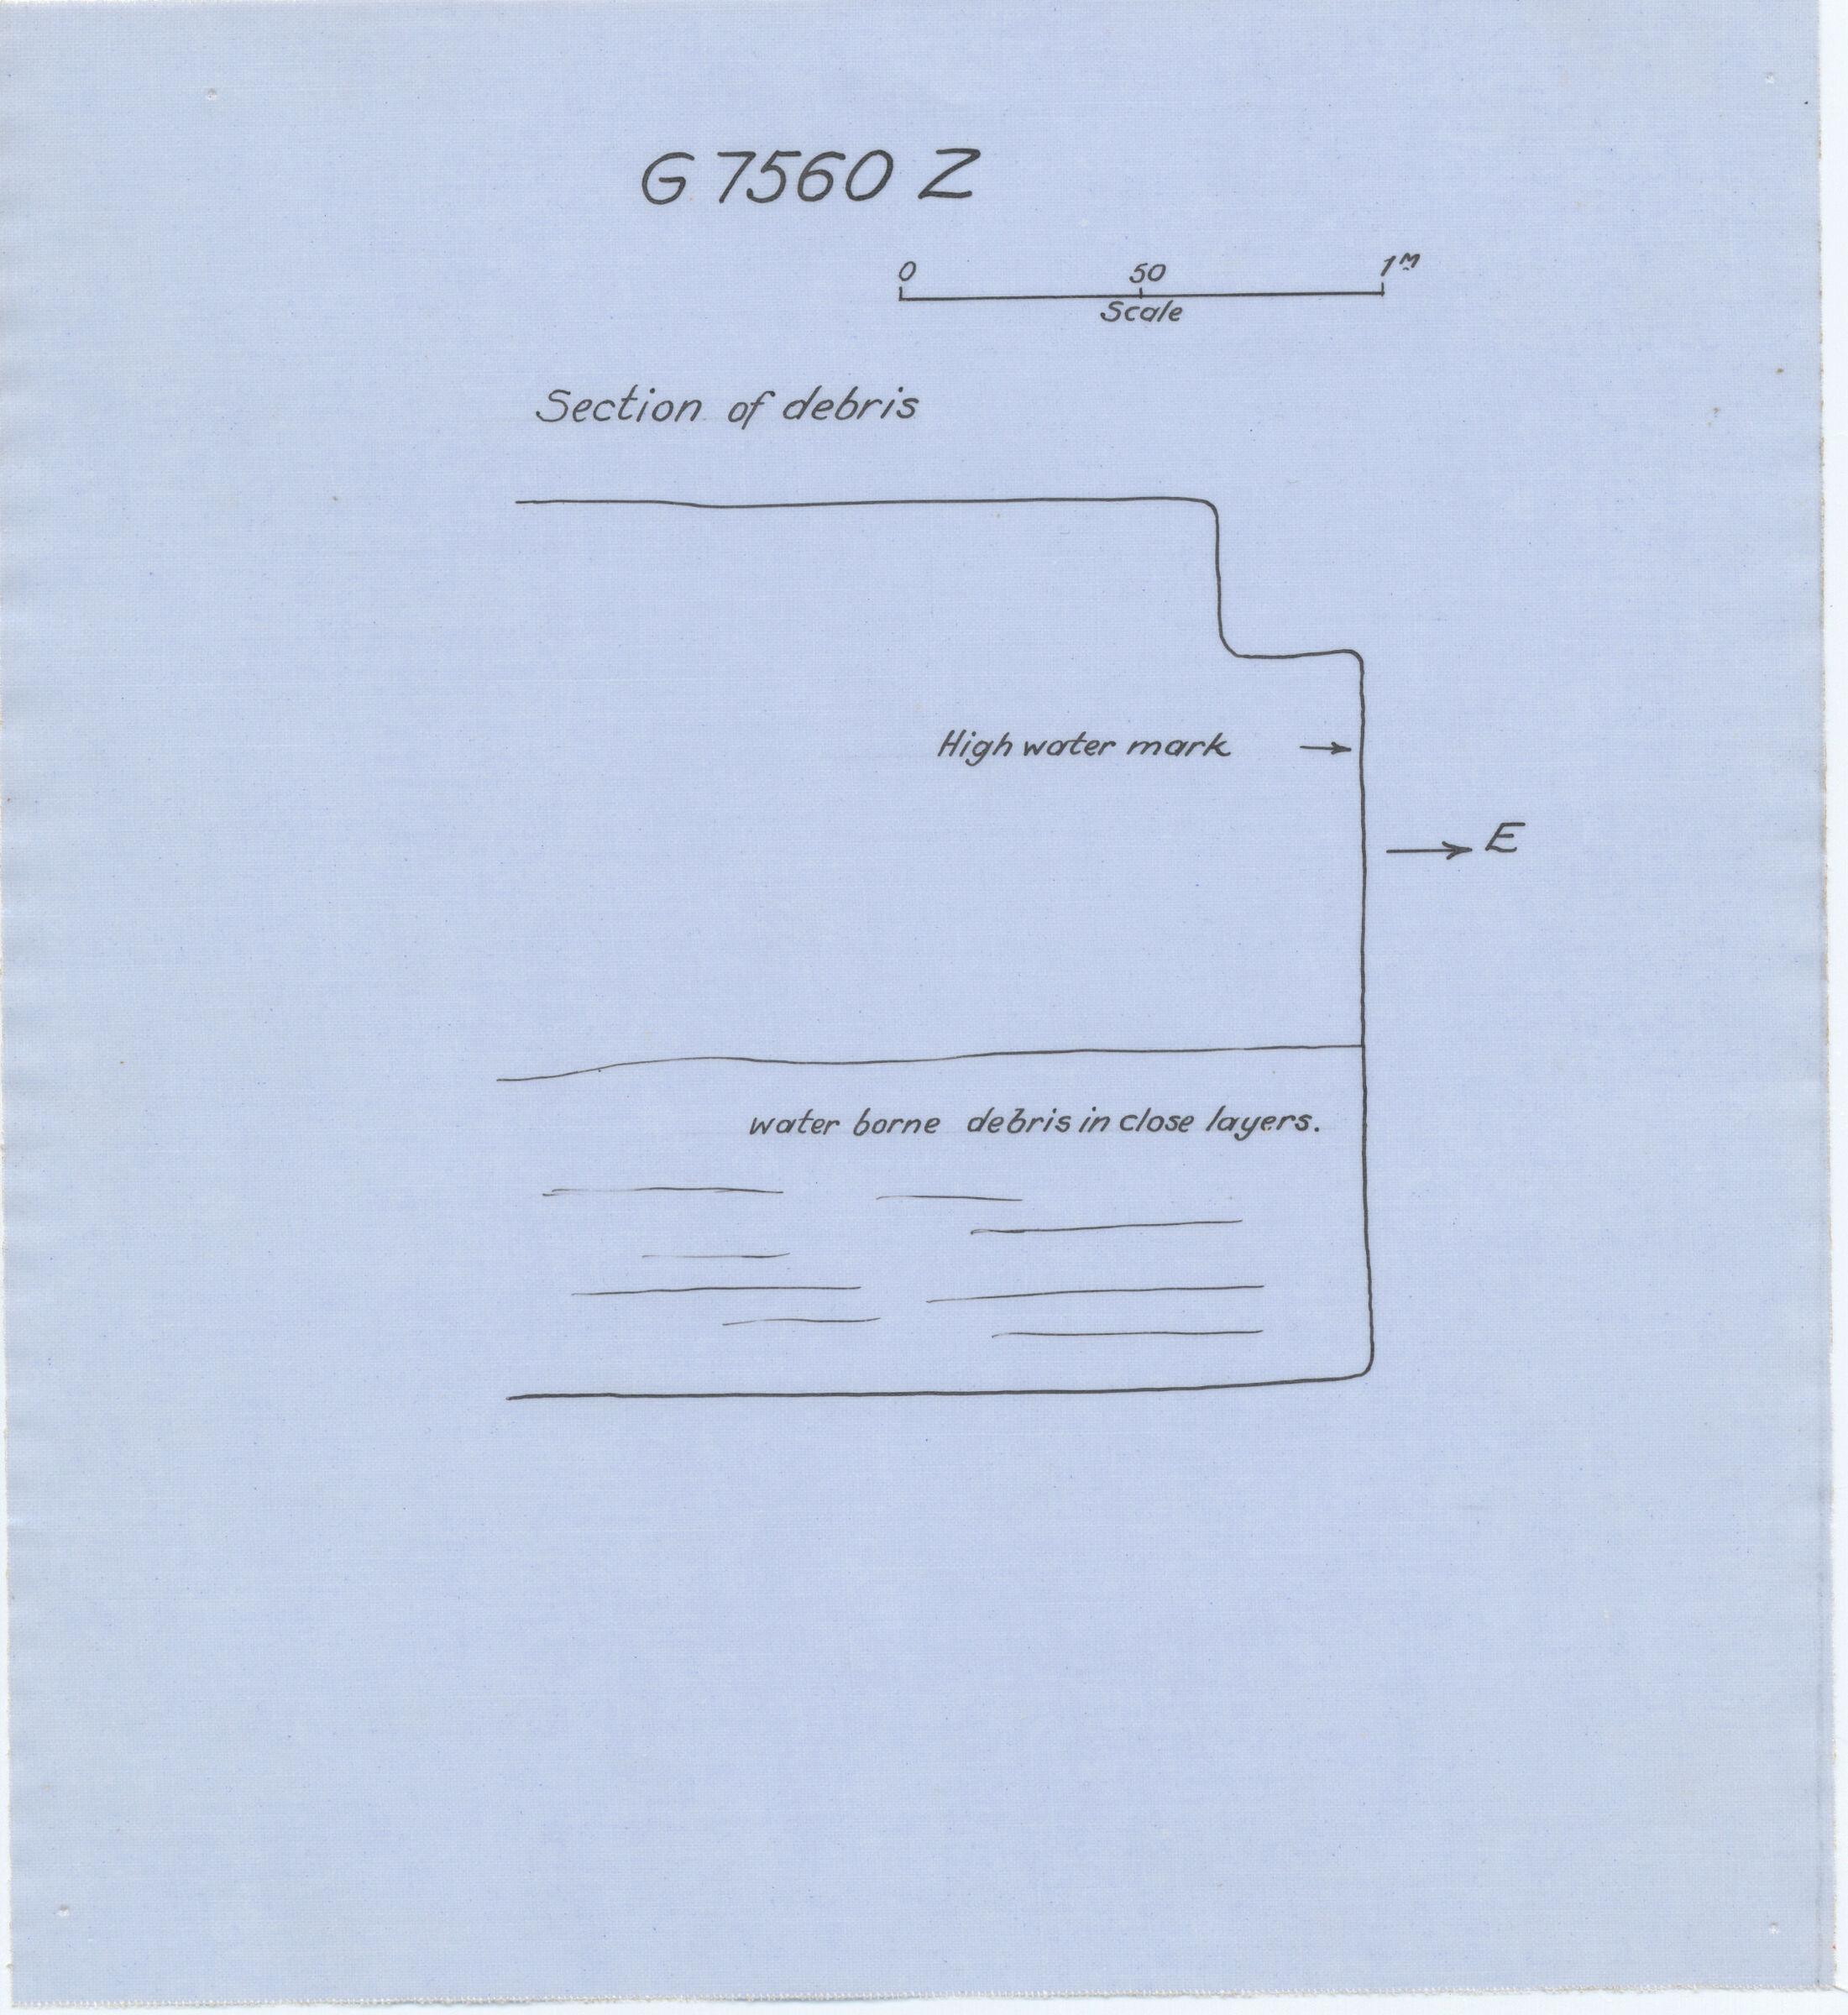 Maps and plans: G 7560, Shaft Z, section of debris inside door